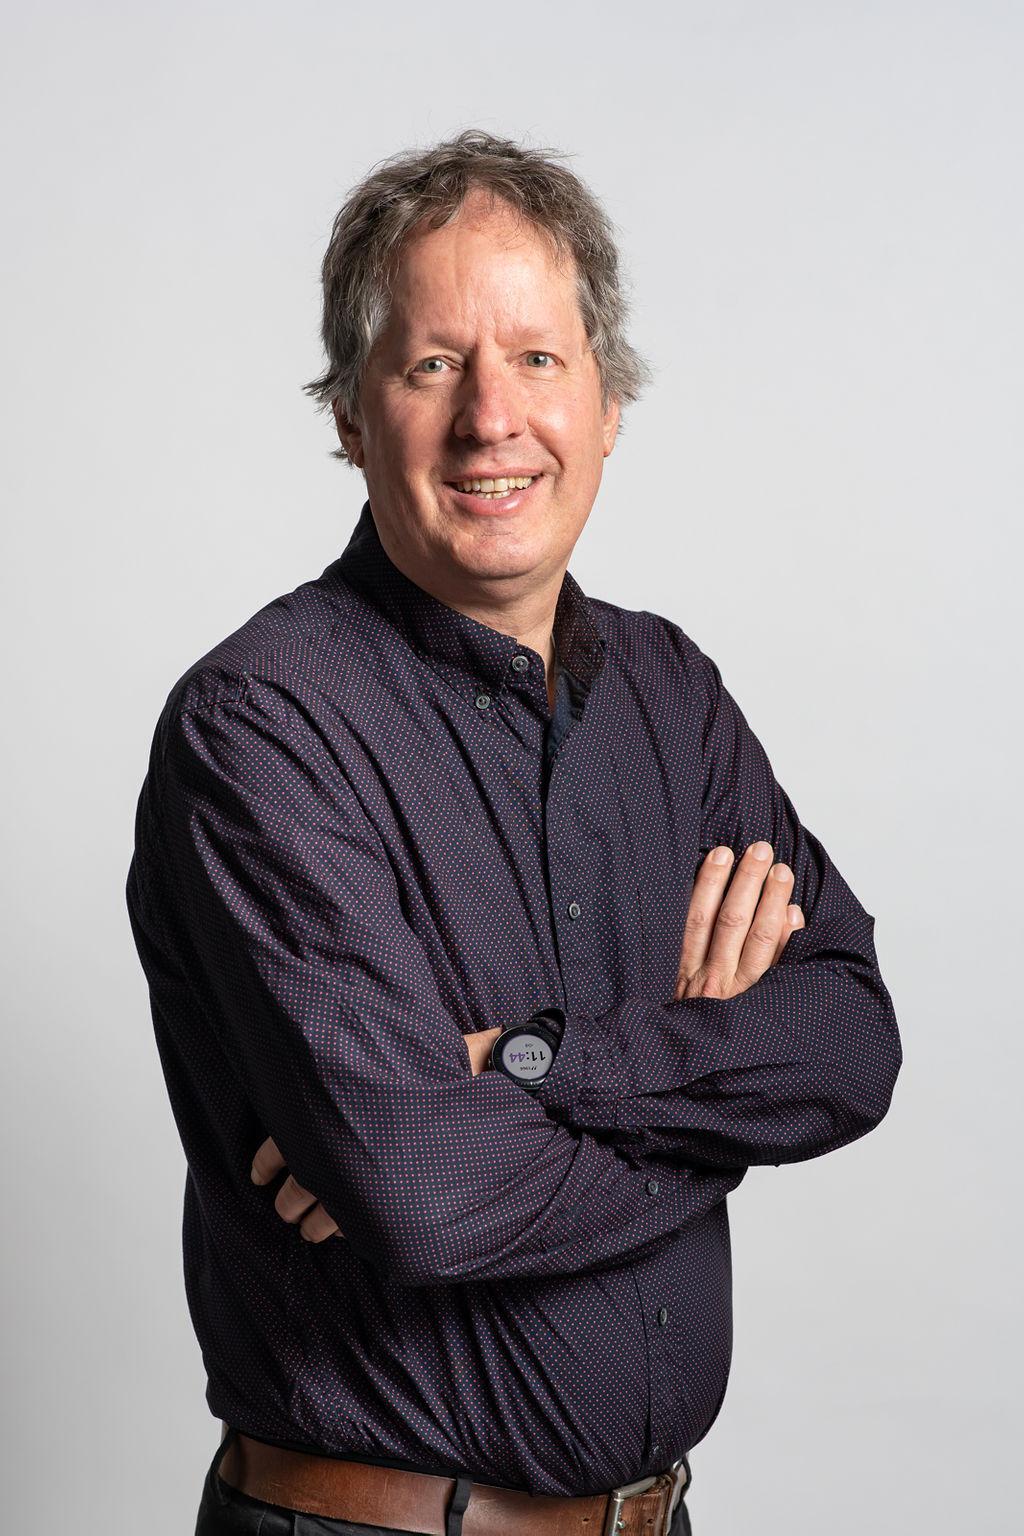 Profile picture of David Goodman